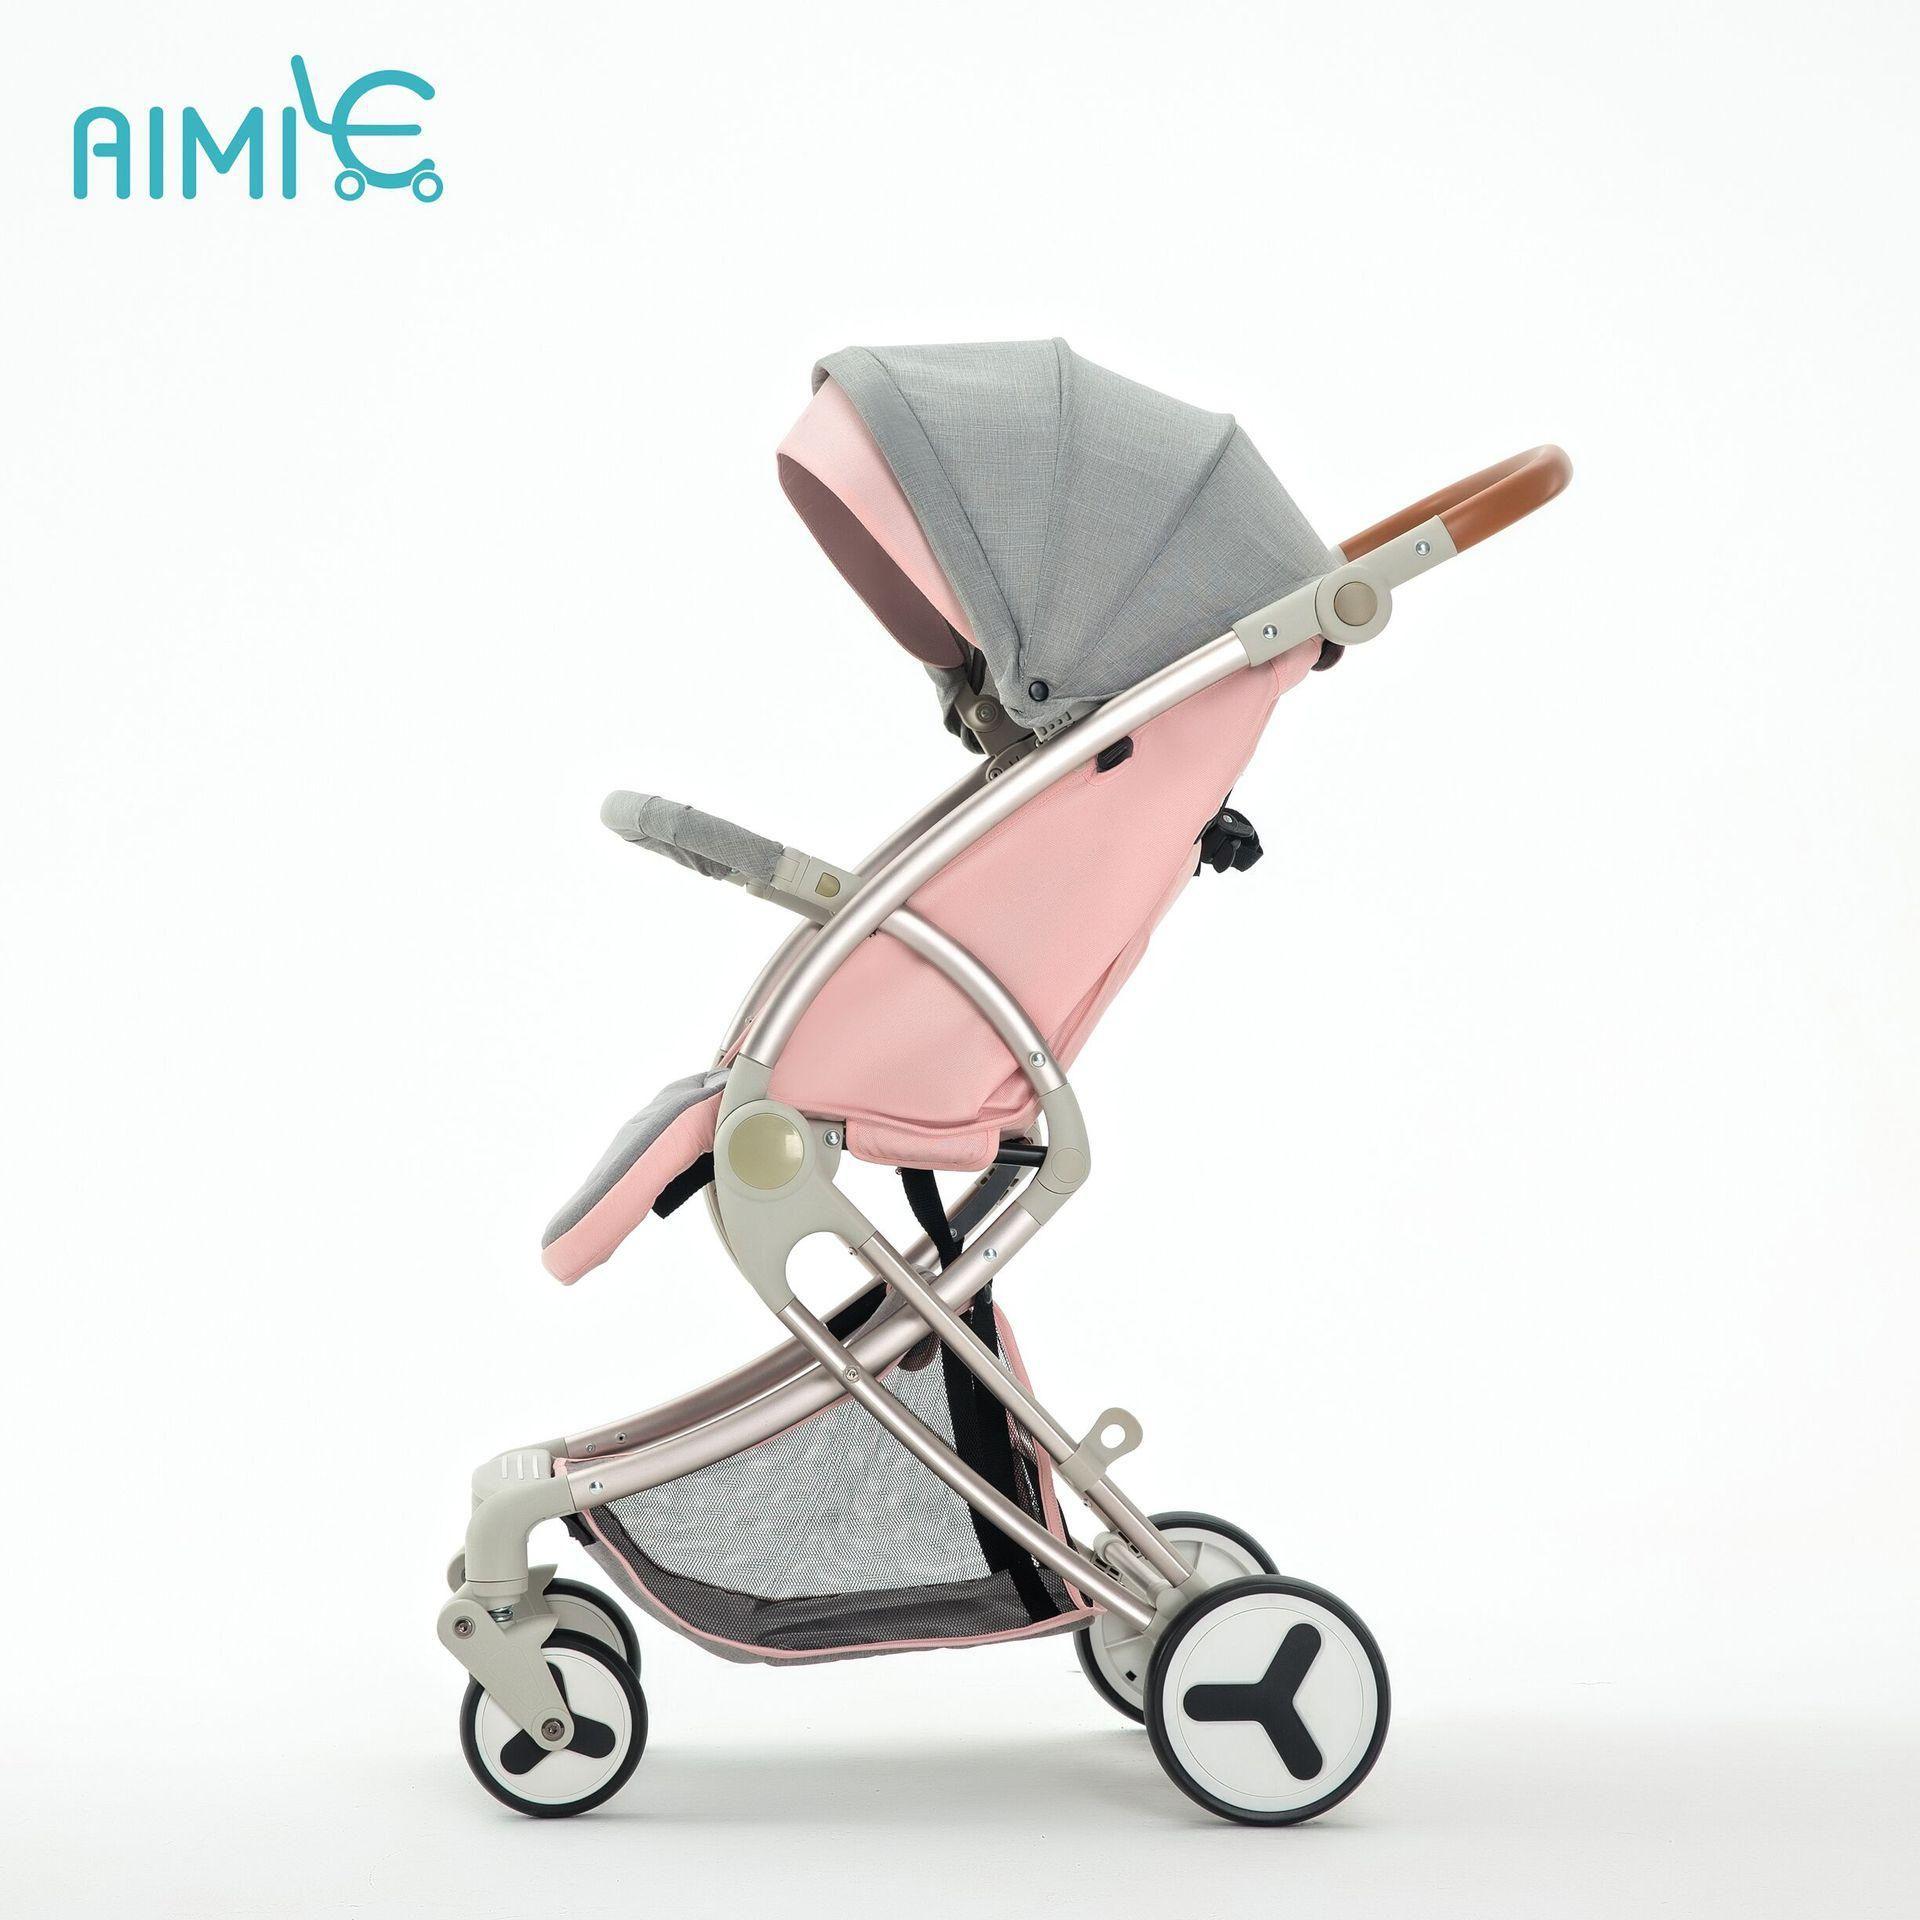 Super Light Baby Stroller Can Sit And Lie Folding Children High Landscape Newborn Travel Stroller Yesterday S Price Baby Strollers Baby Trolley Stroller